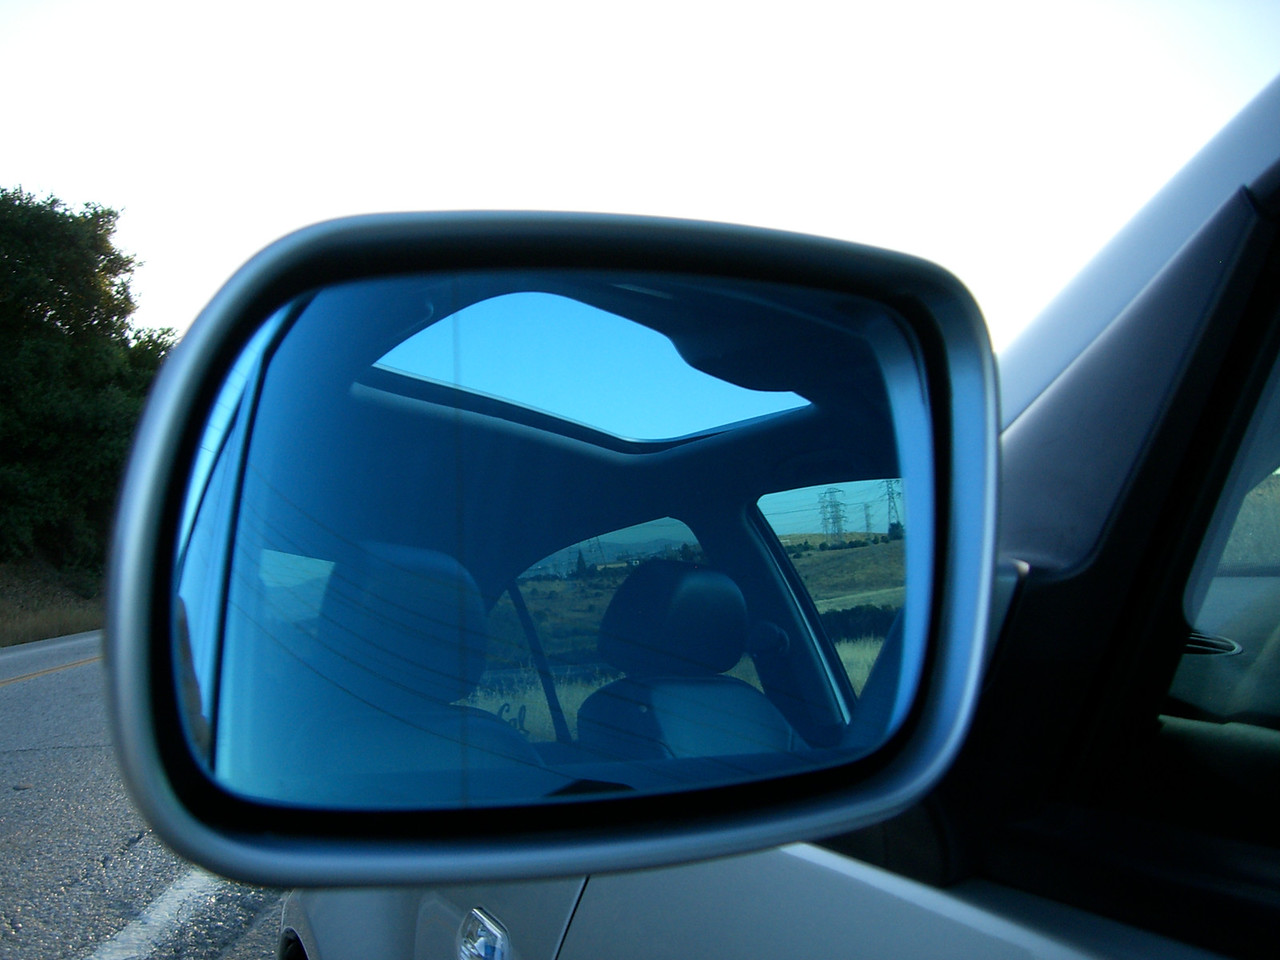 2006 06 07 Wed - Bora euro mirror 1